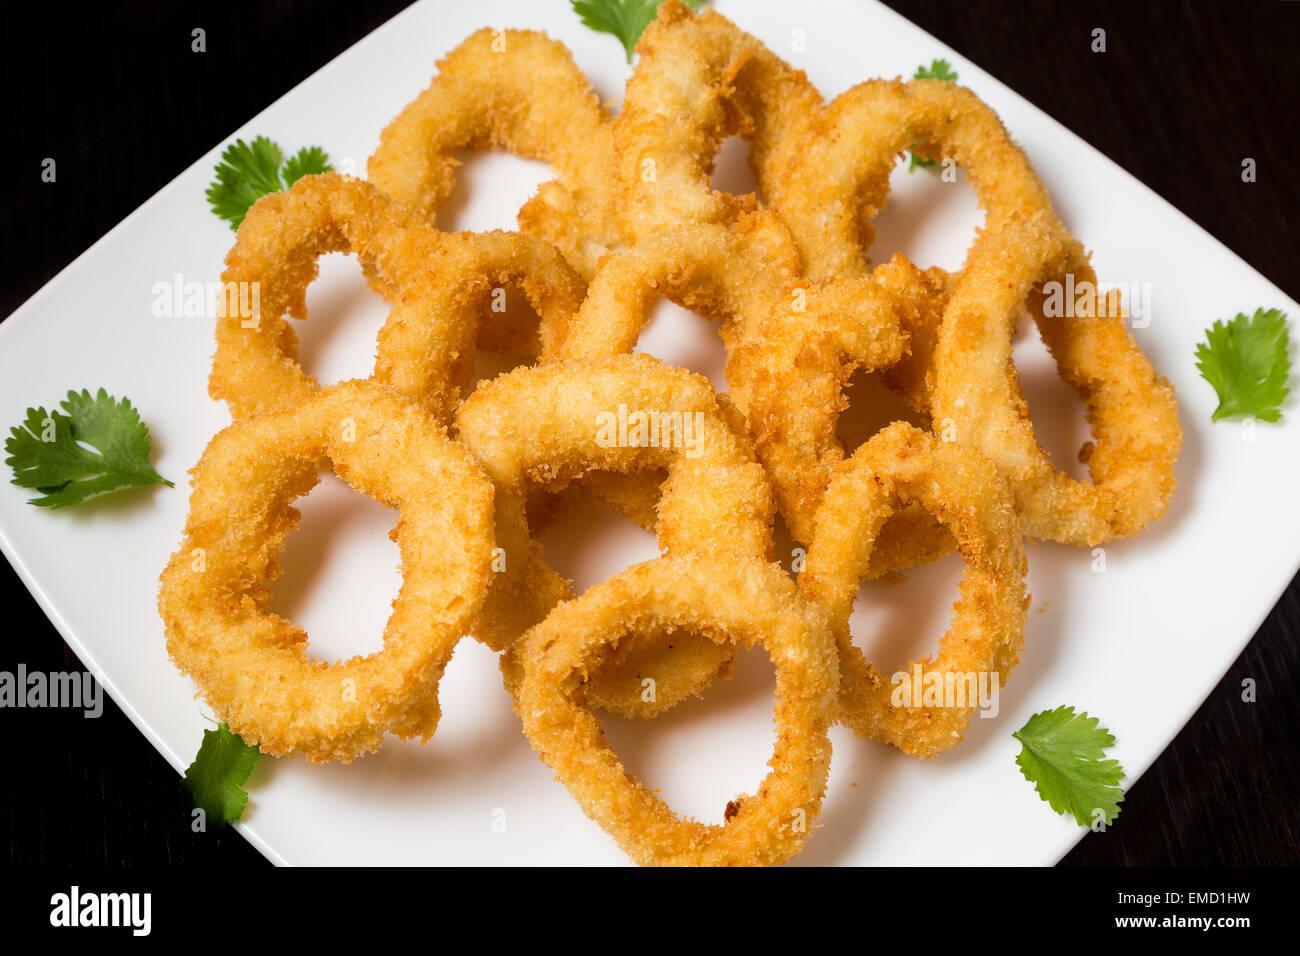 Calamari - Stock Image